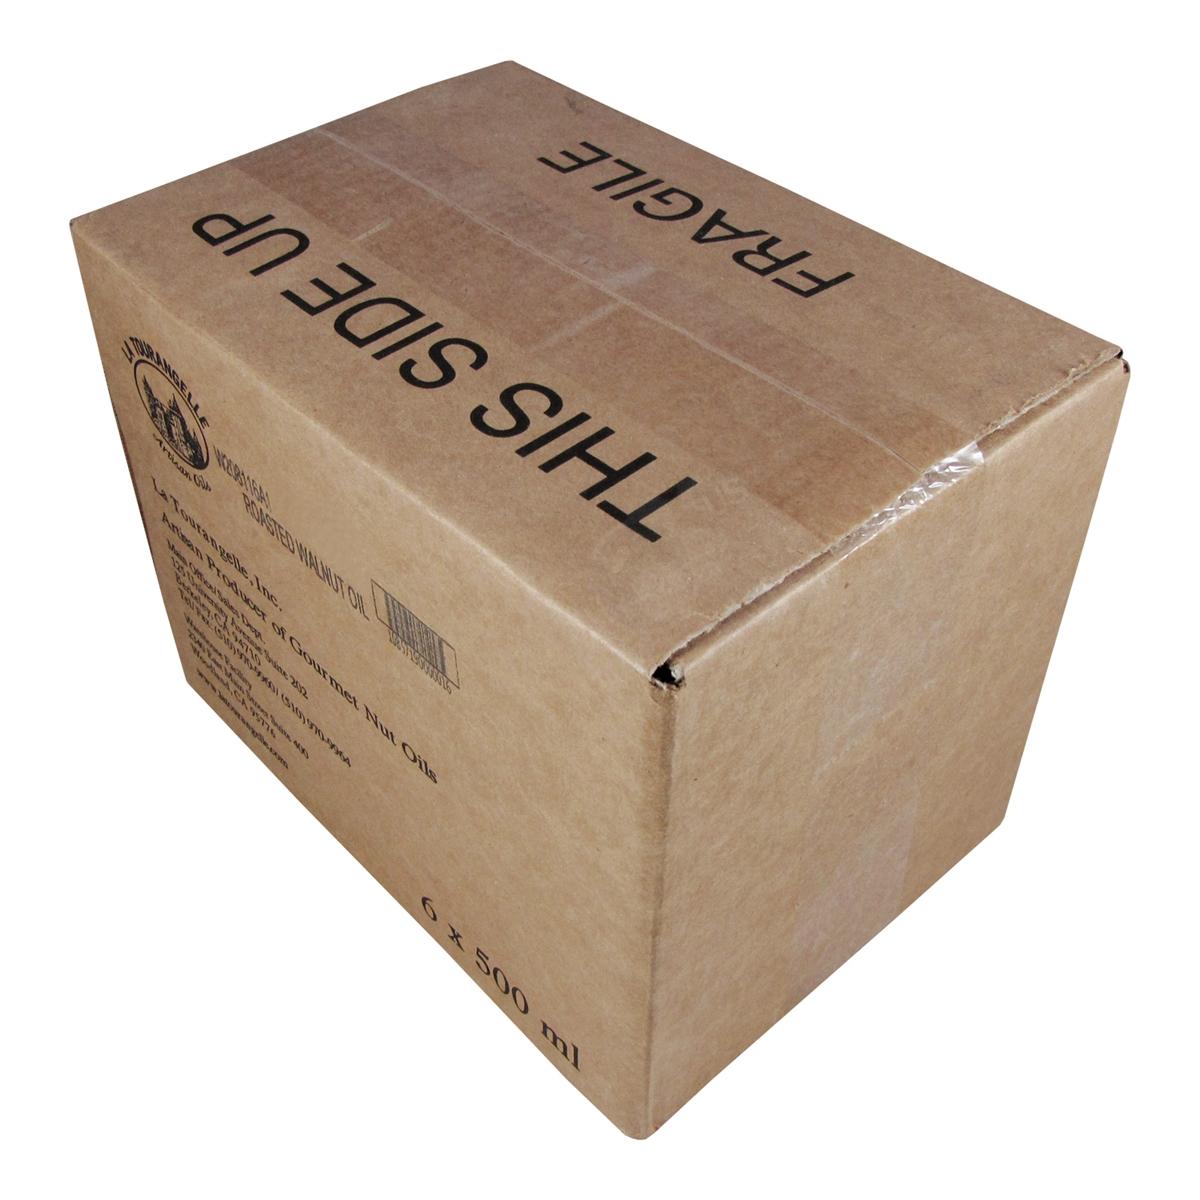 Roasted Walnut Oil - 16.9 oz. (La Tourangelle)